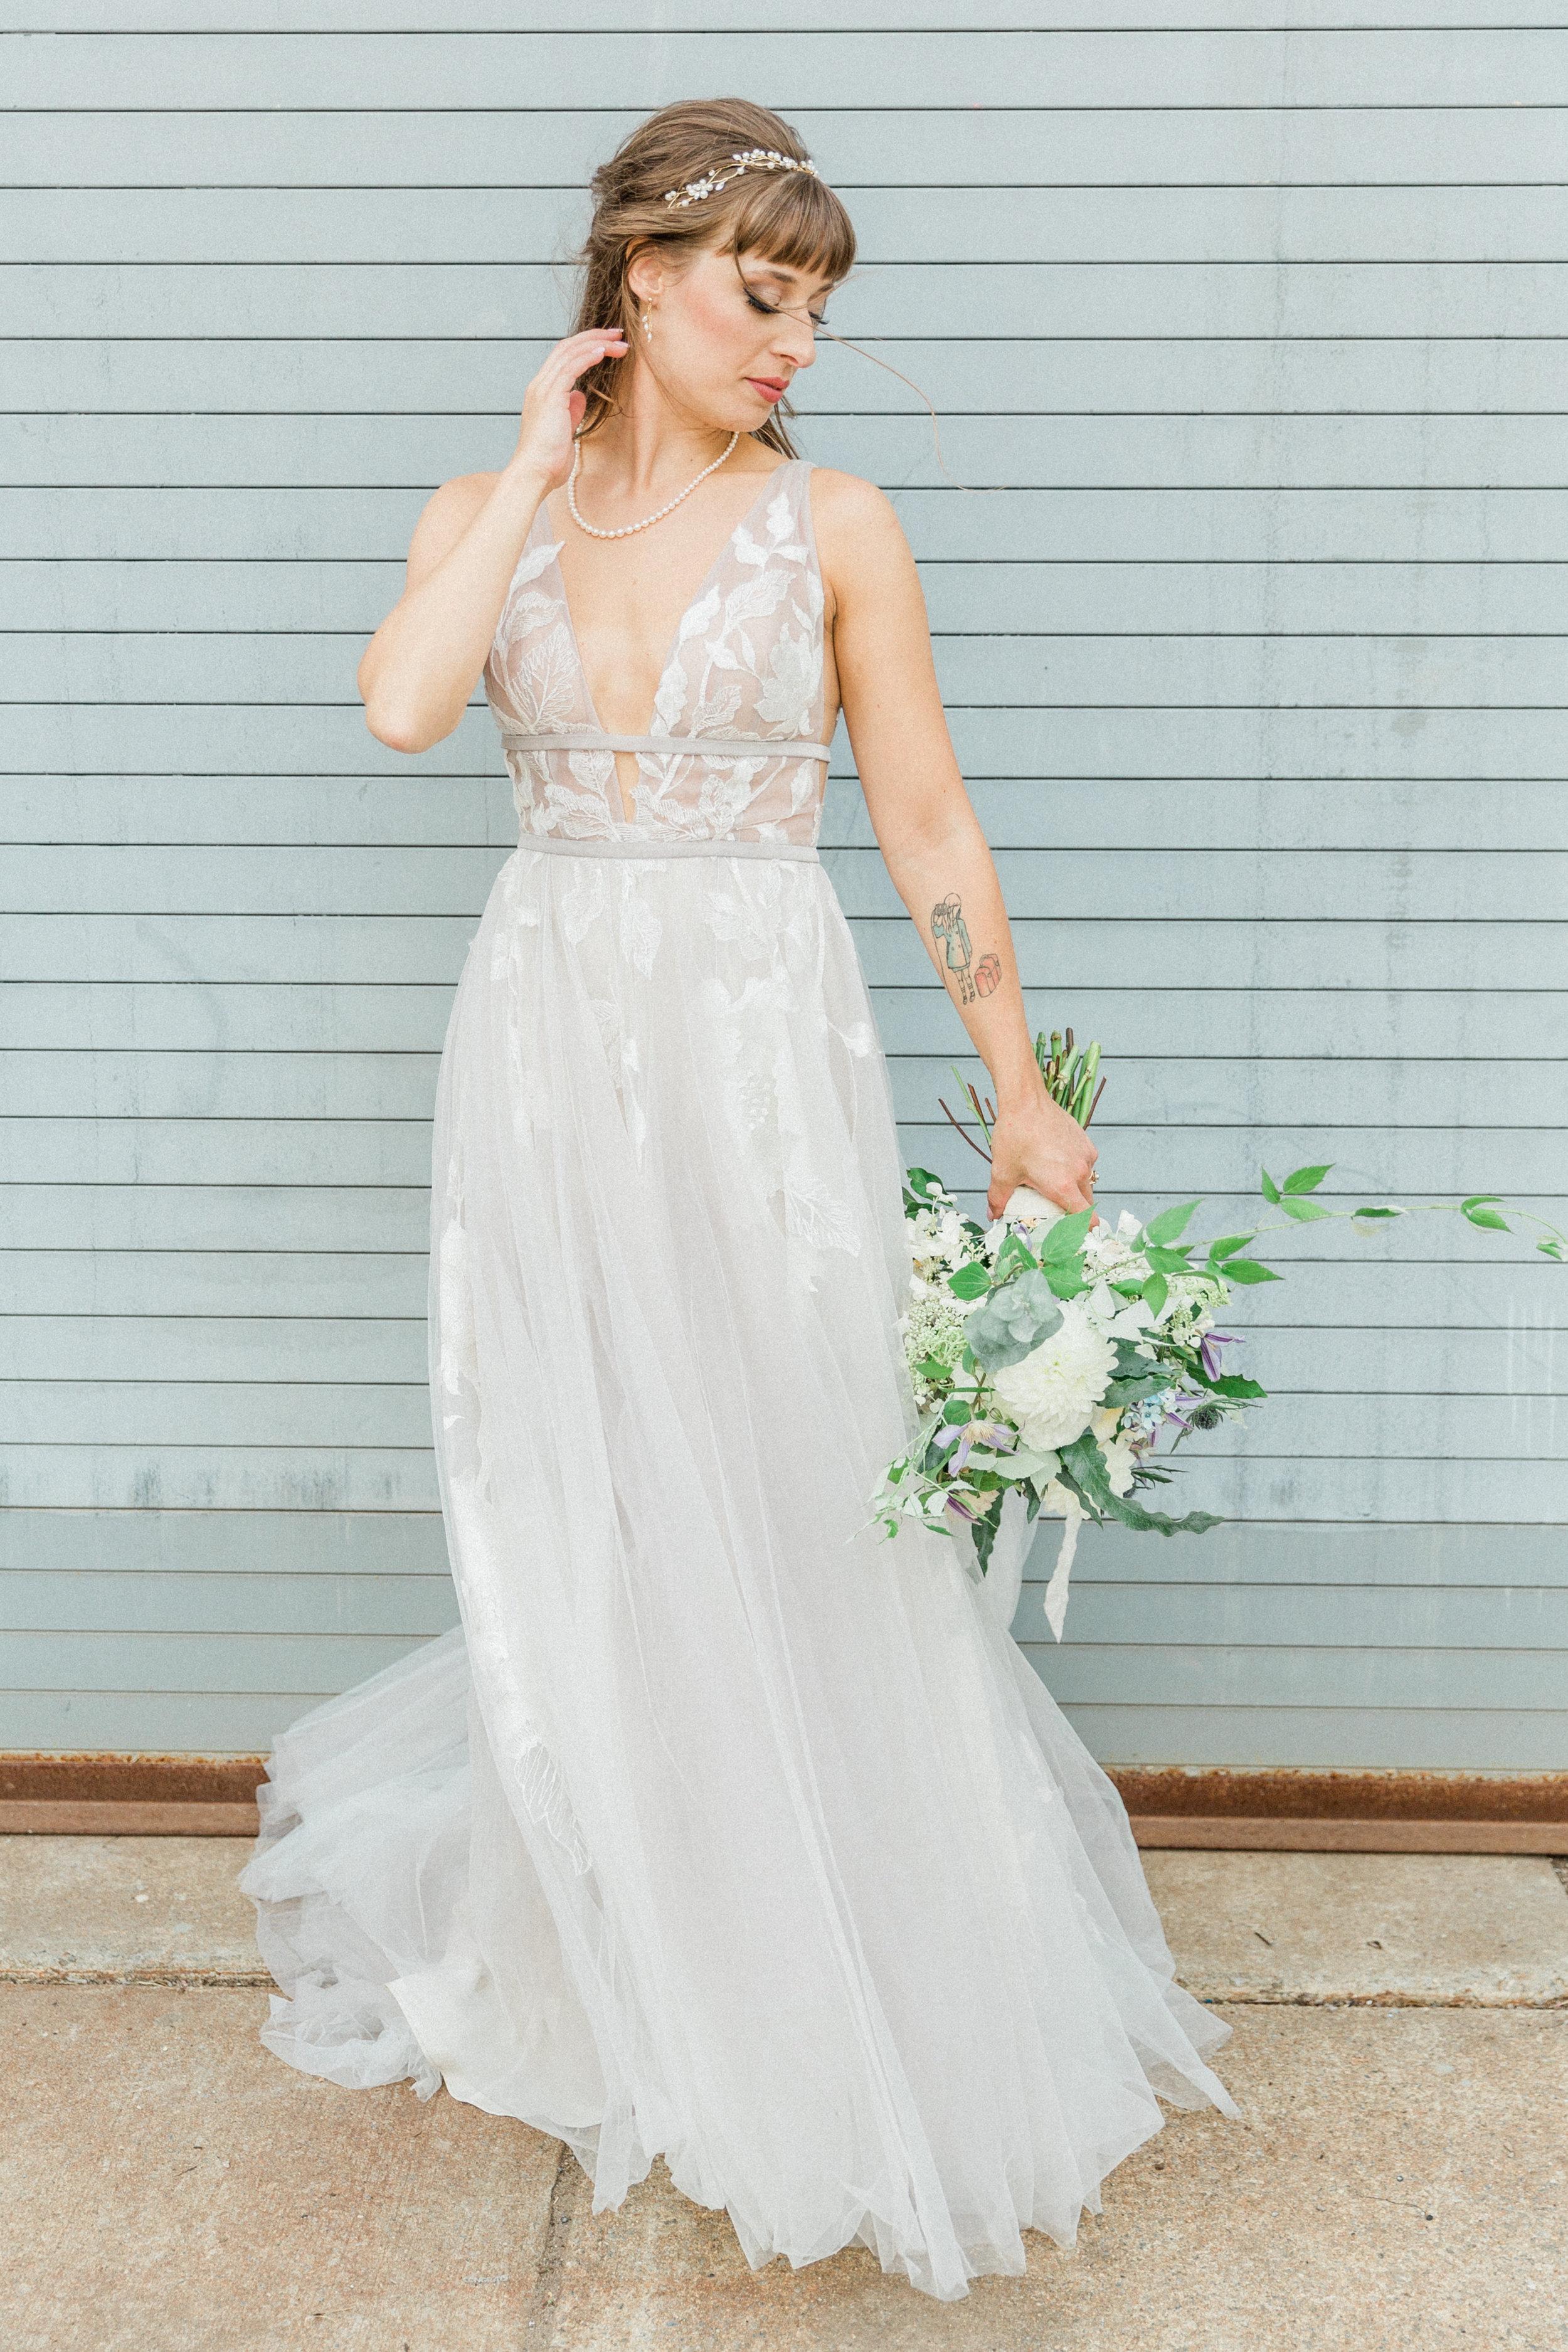 Mallory and Aaron - Married - Sneaks - Lauren Alisse Photography-55.jpg